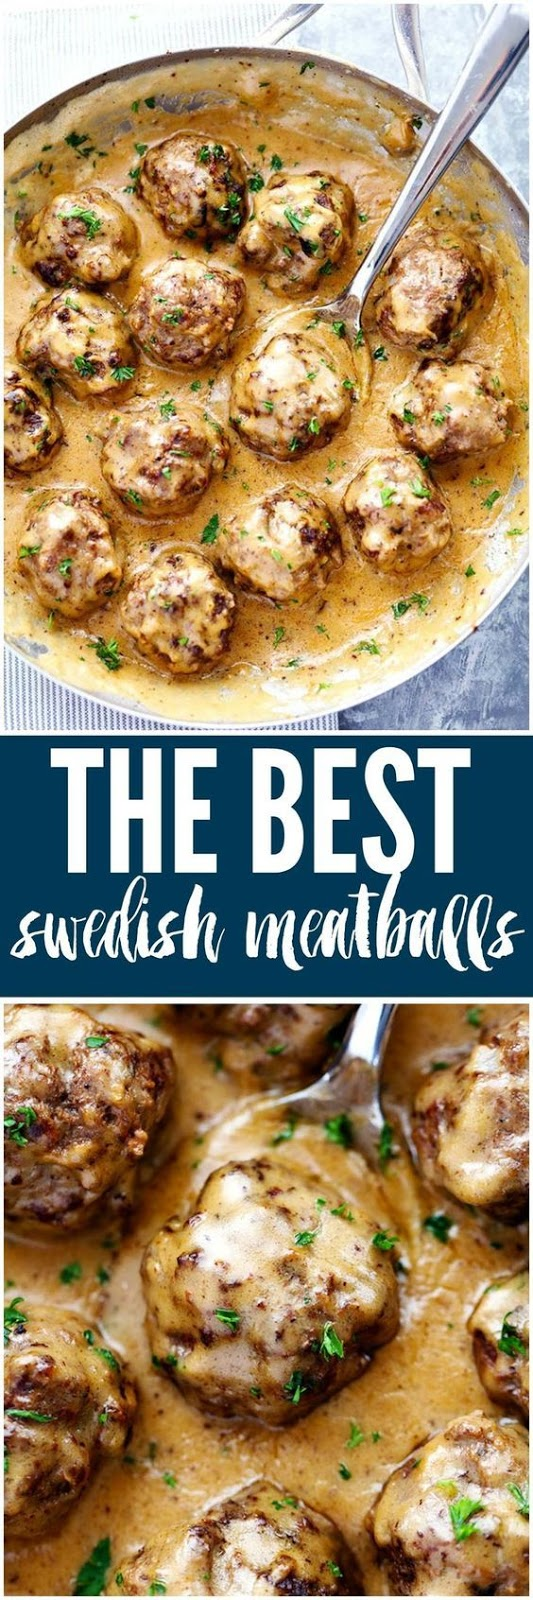 THE BEST SWEDISH MEATBALLS